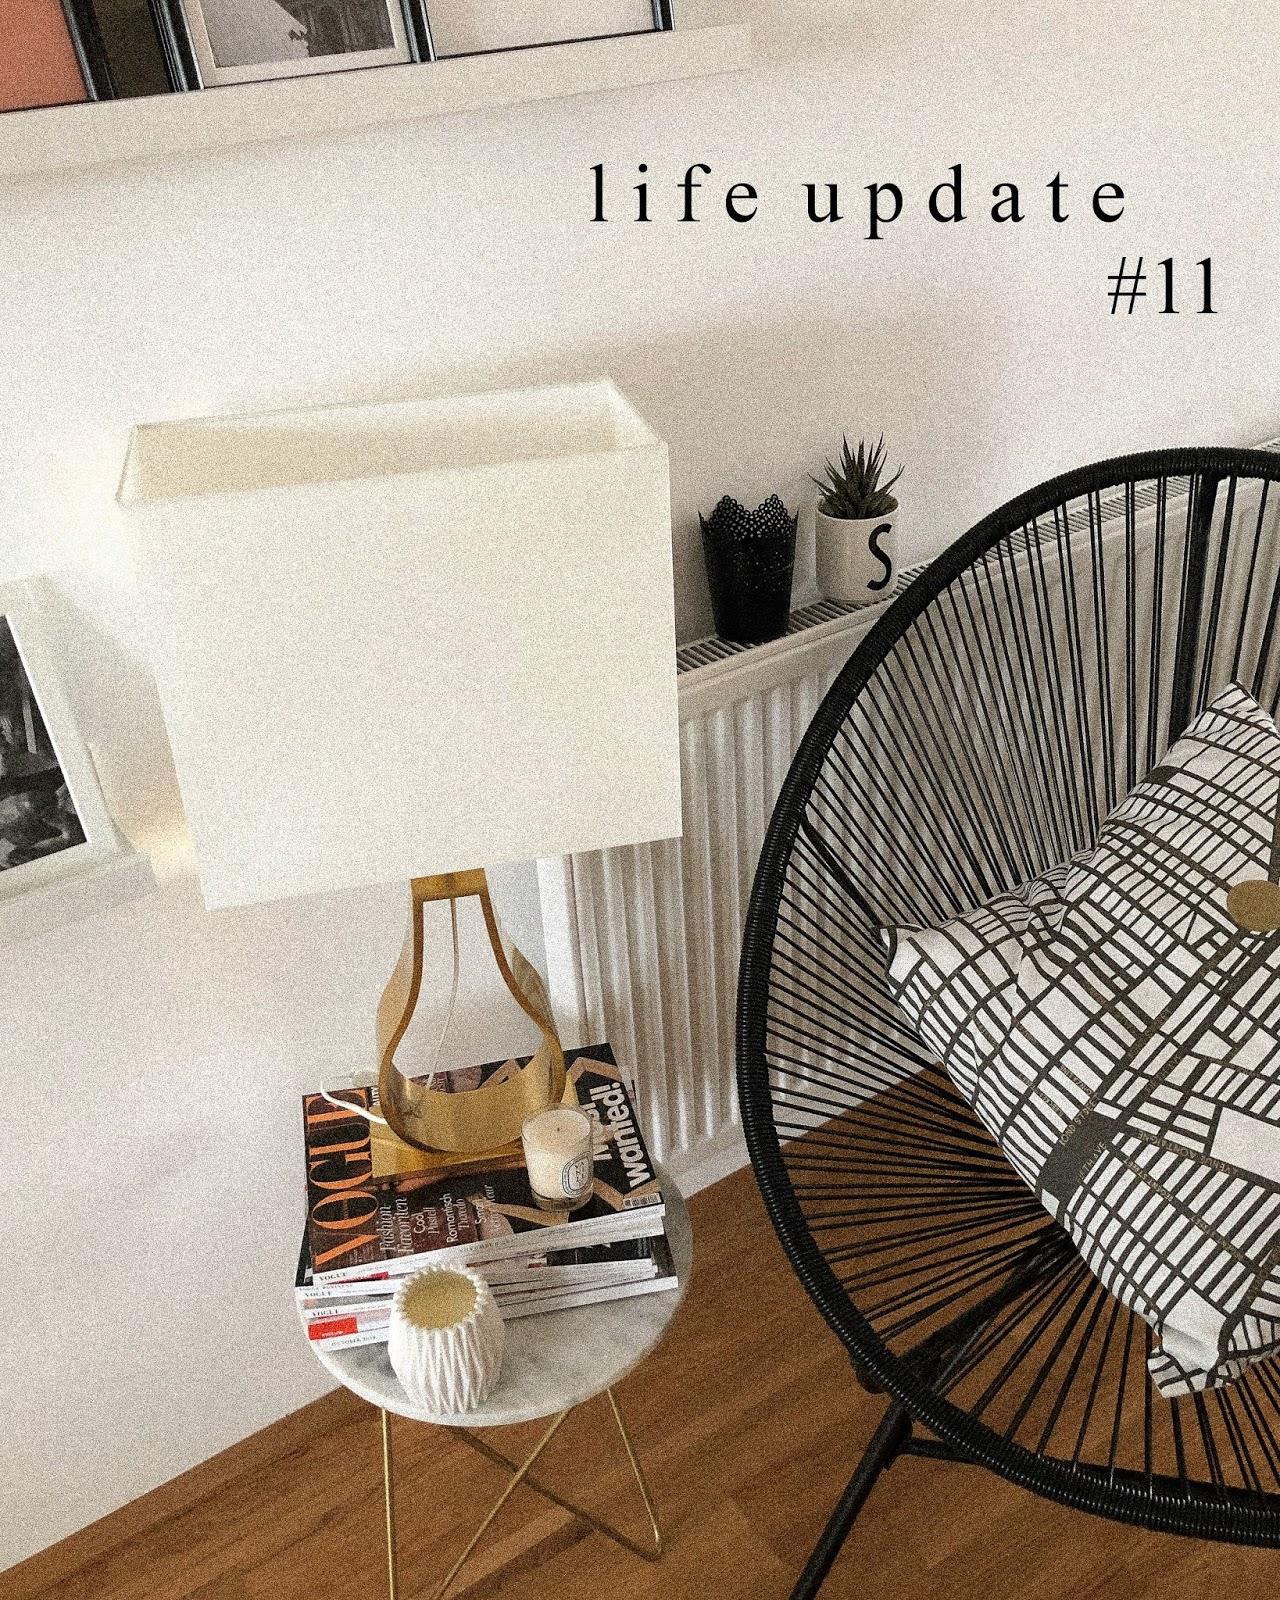 LIFE UPDATE #11